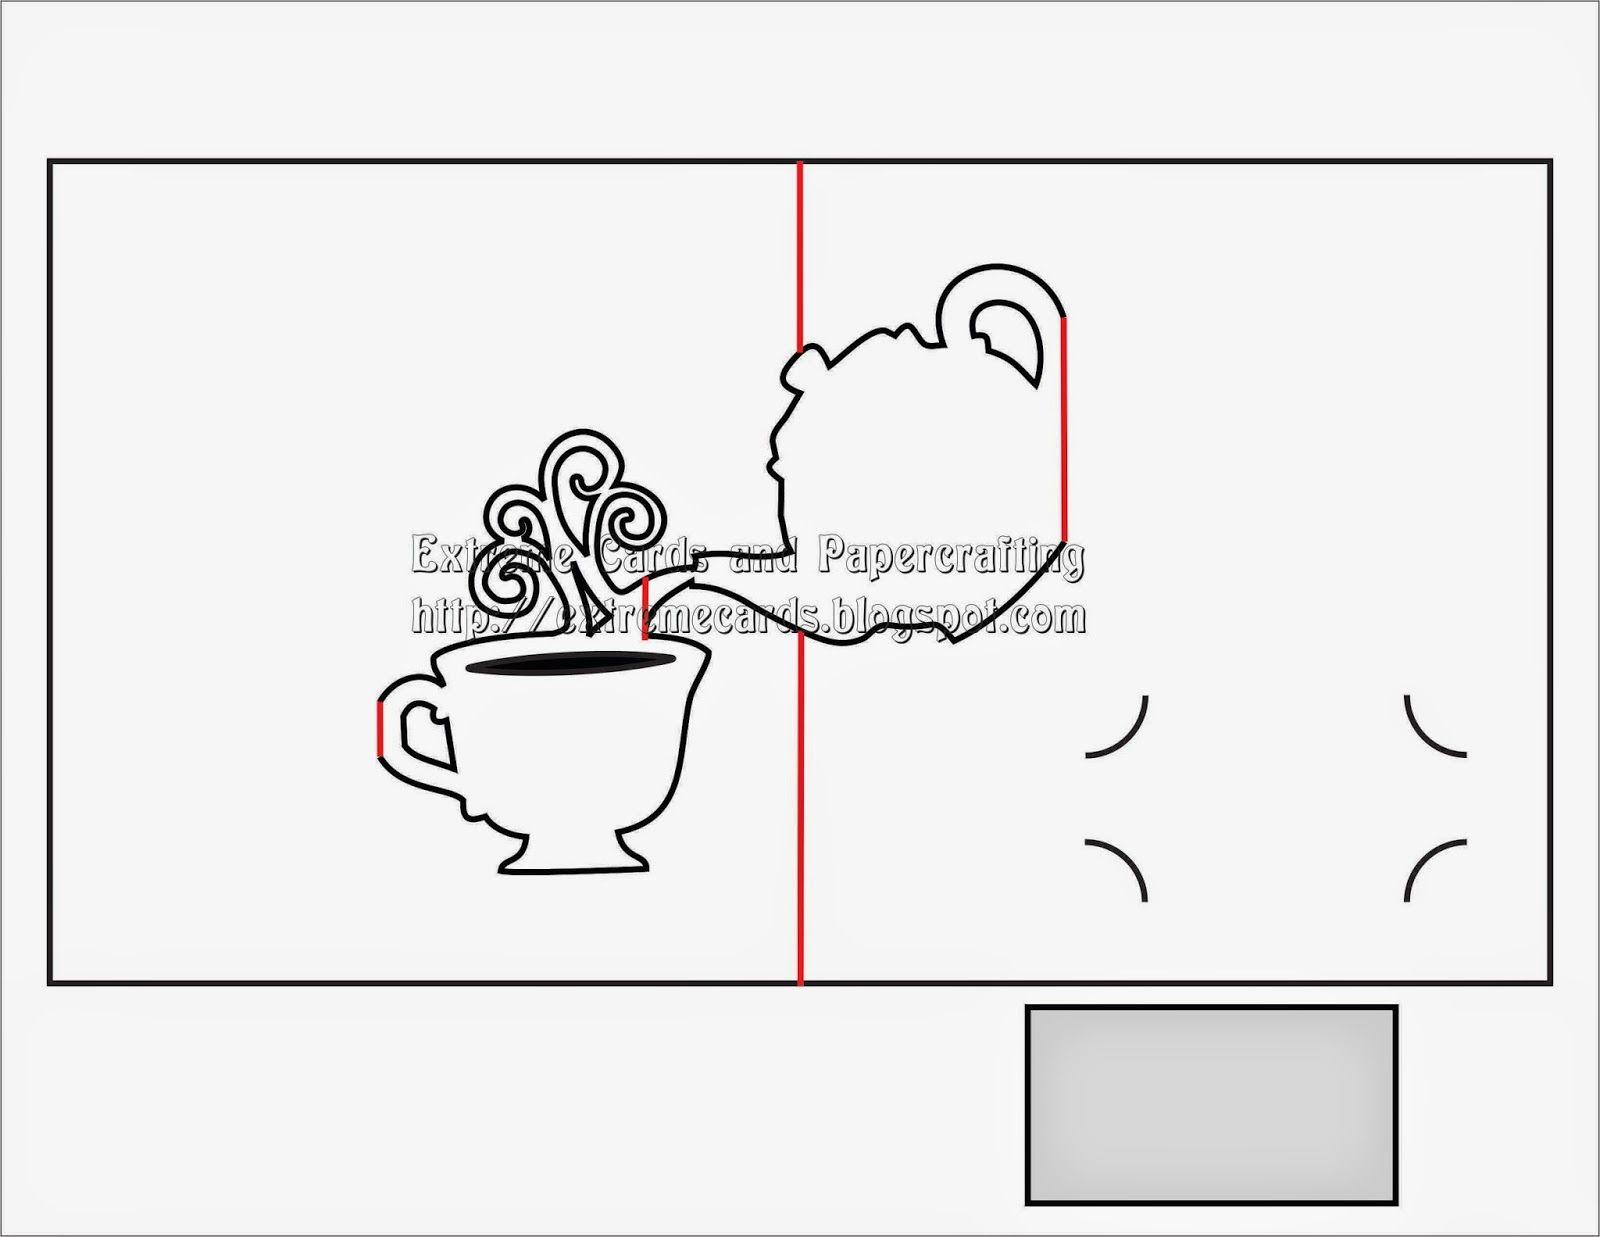 tetera y la taza de pop-up de tarjetas | laser | Pinterest | La taza ...